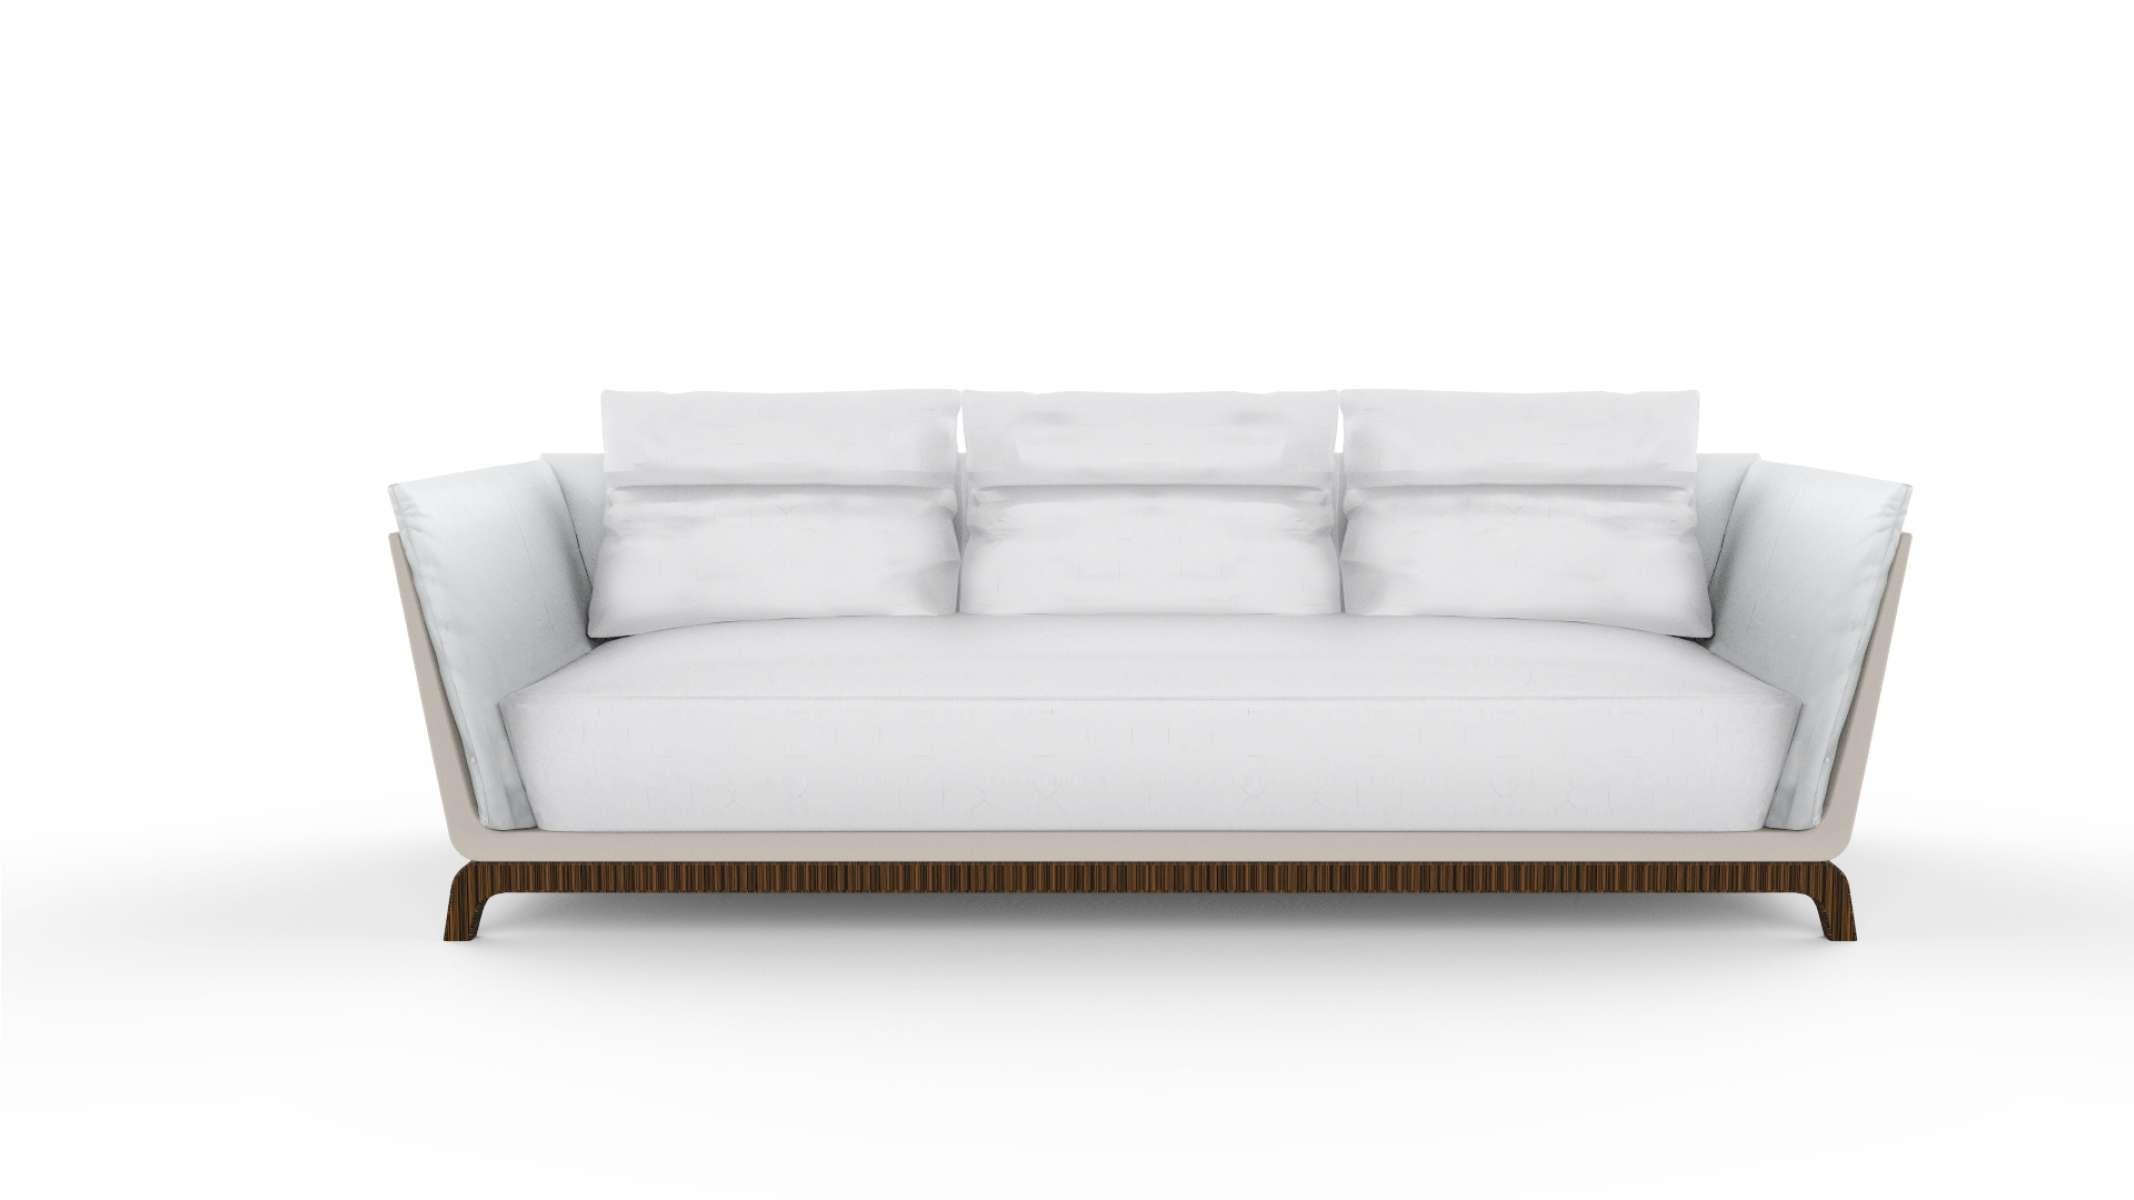 Studio Marco Piva – Product design – 386